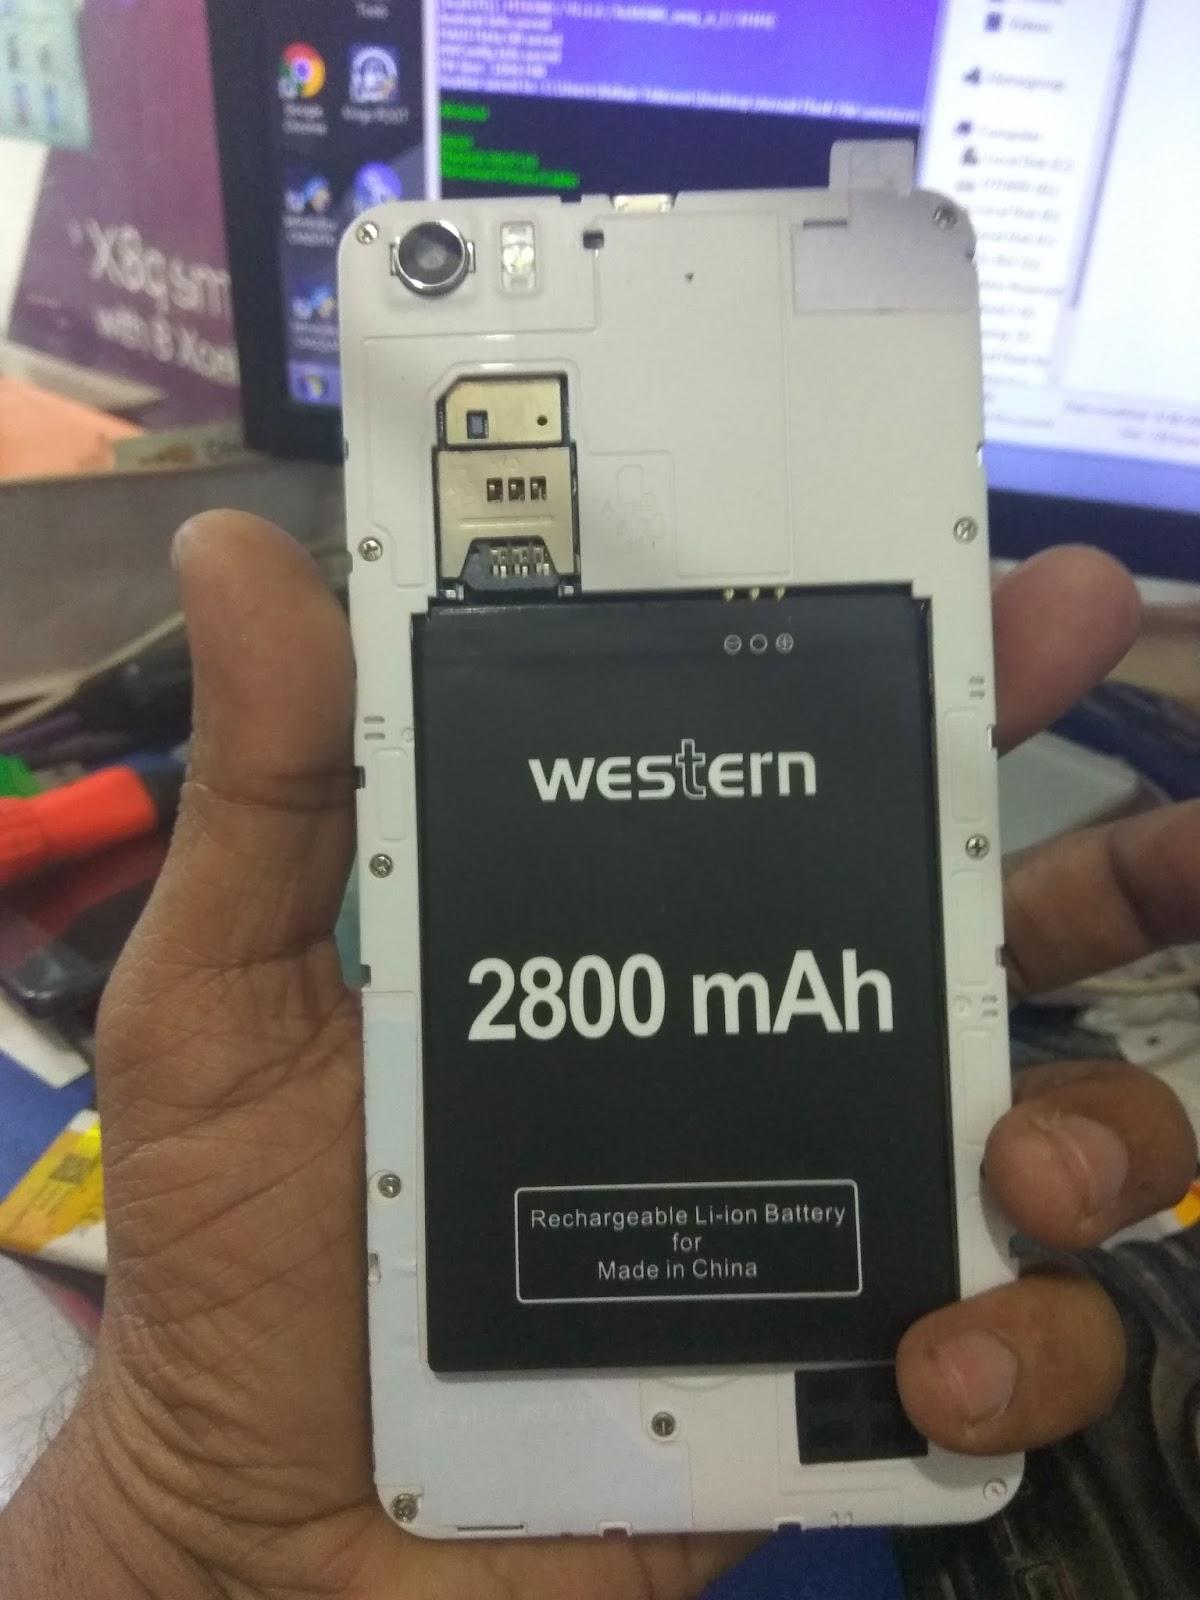 MT6580 Western X1 hct6580 weg a l 5 1 ALPS L1 MP6 V2 19 HCT6580 WEG A L P55